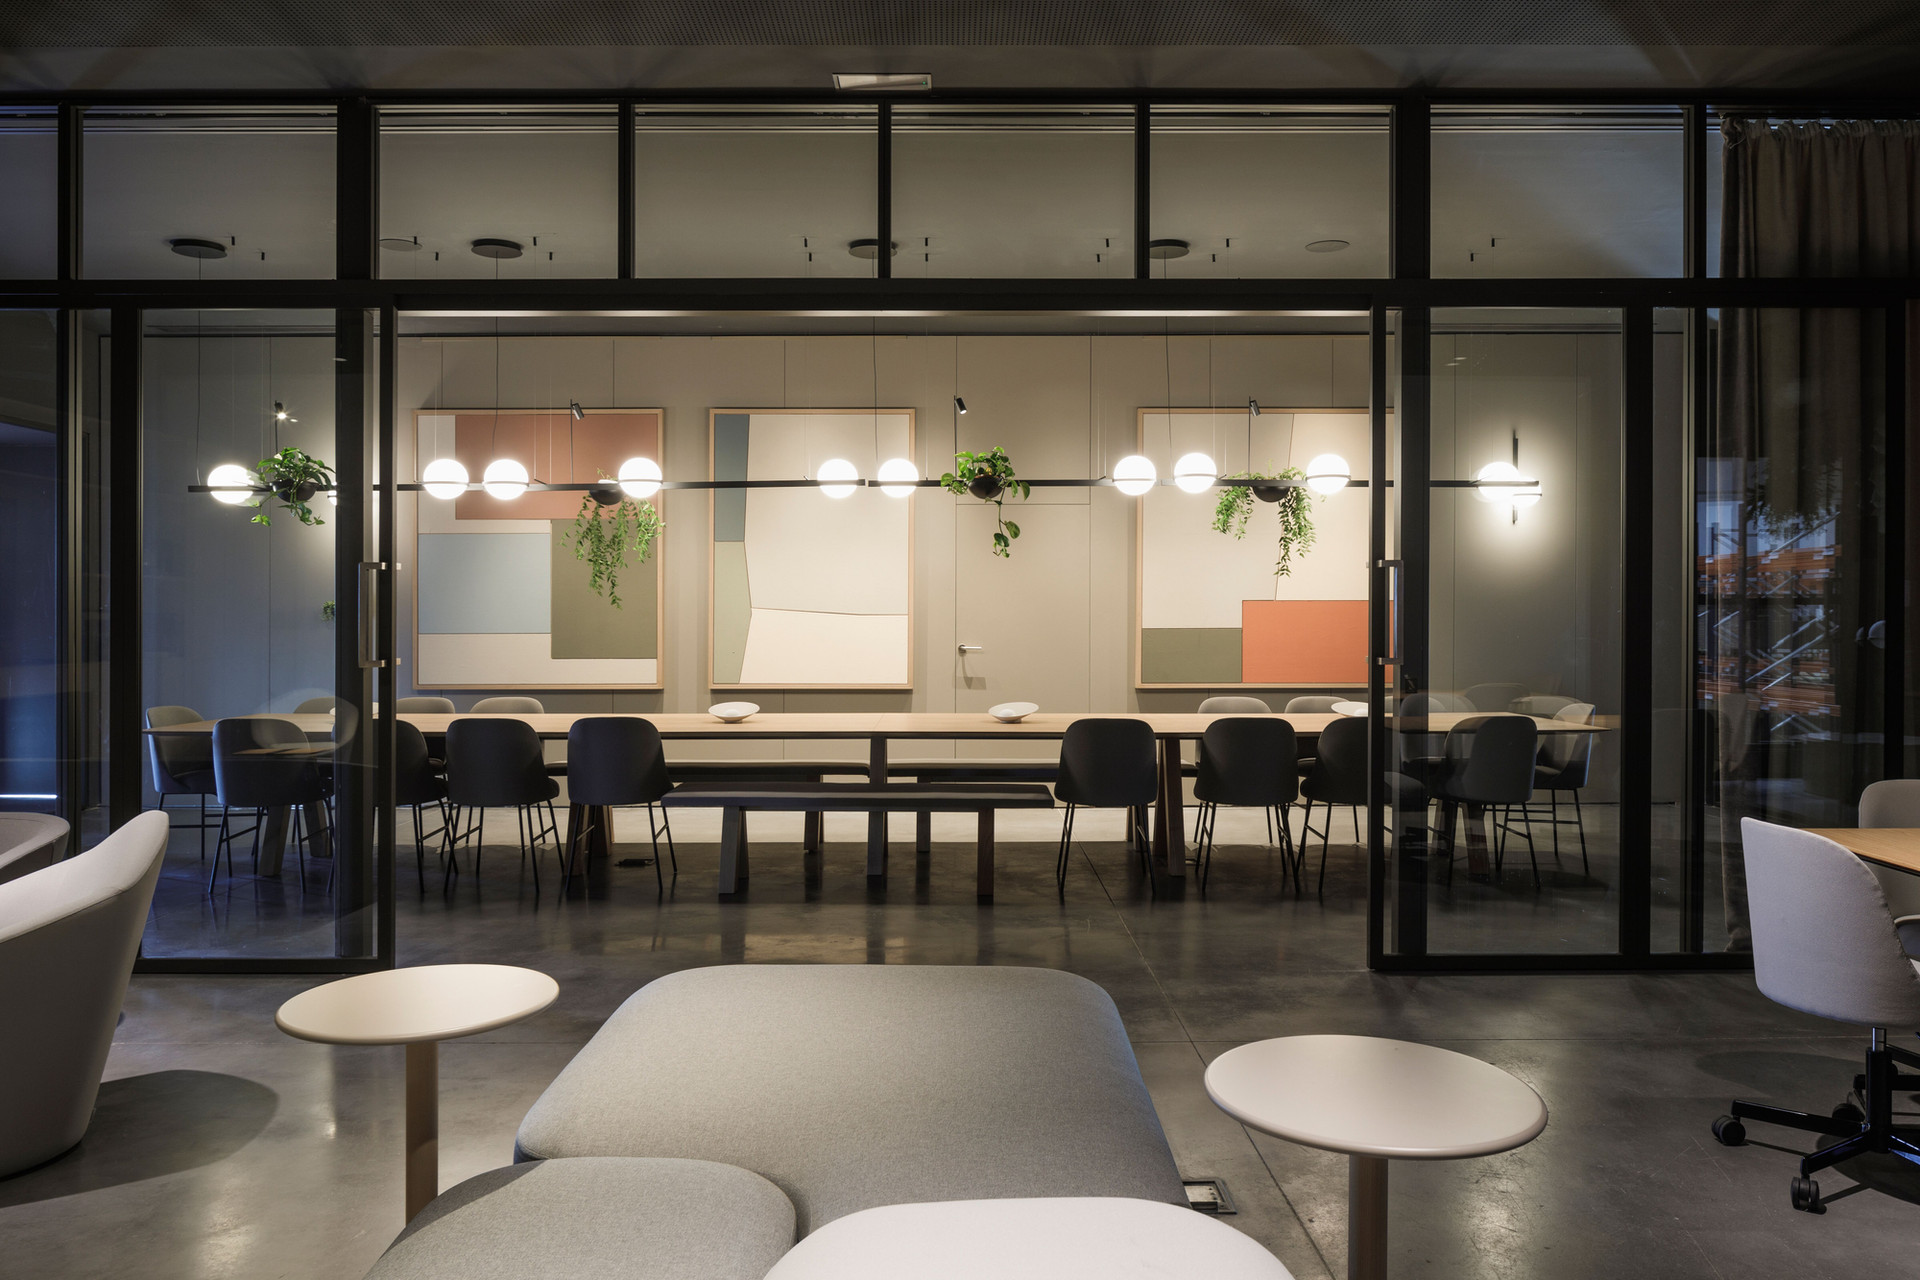 VIBIA_sausriballonch.arquitectes (4).jpe